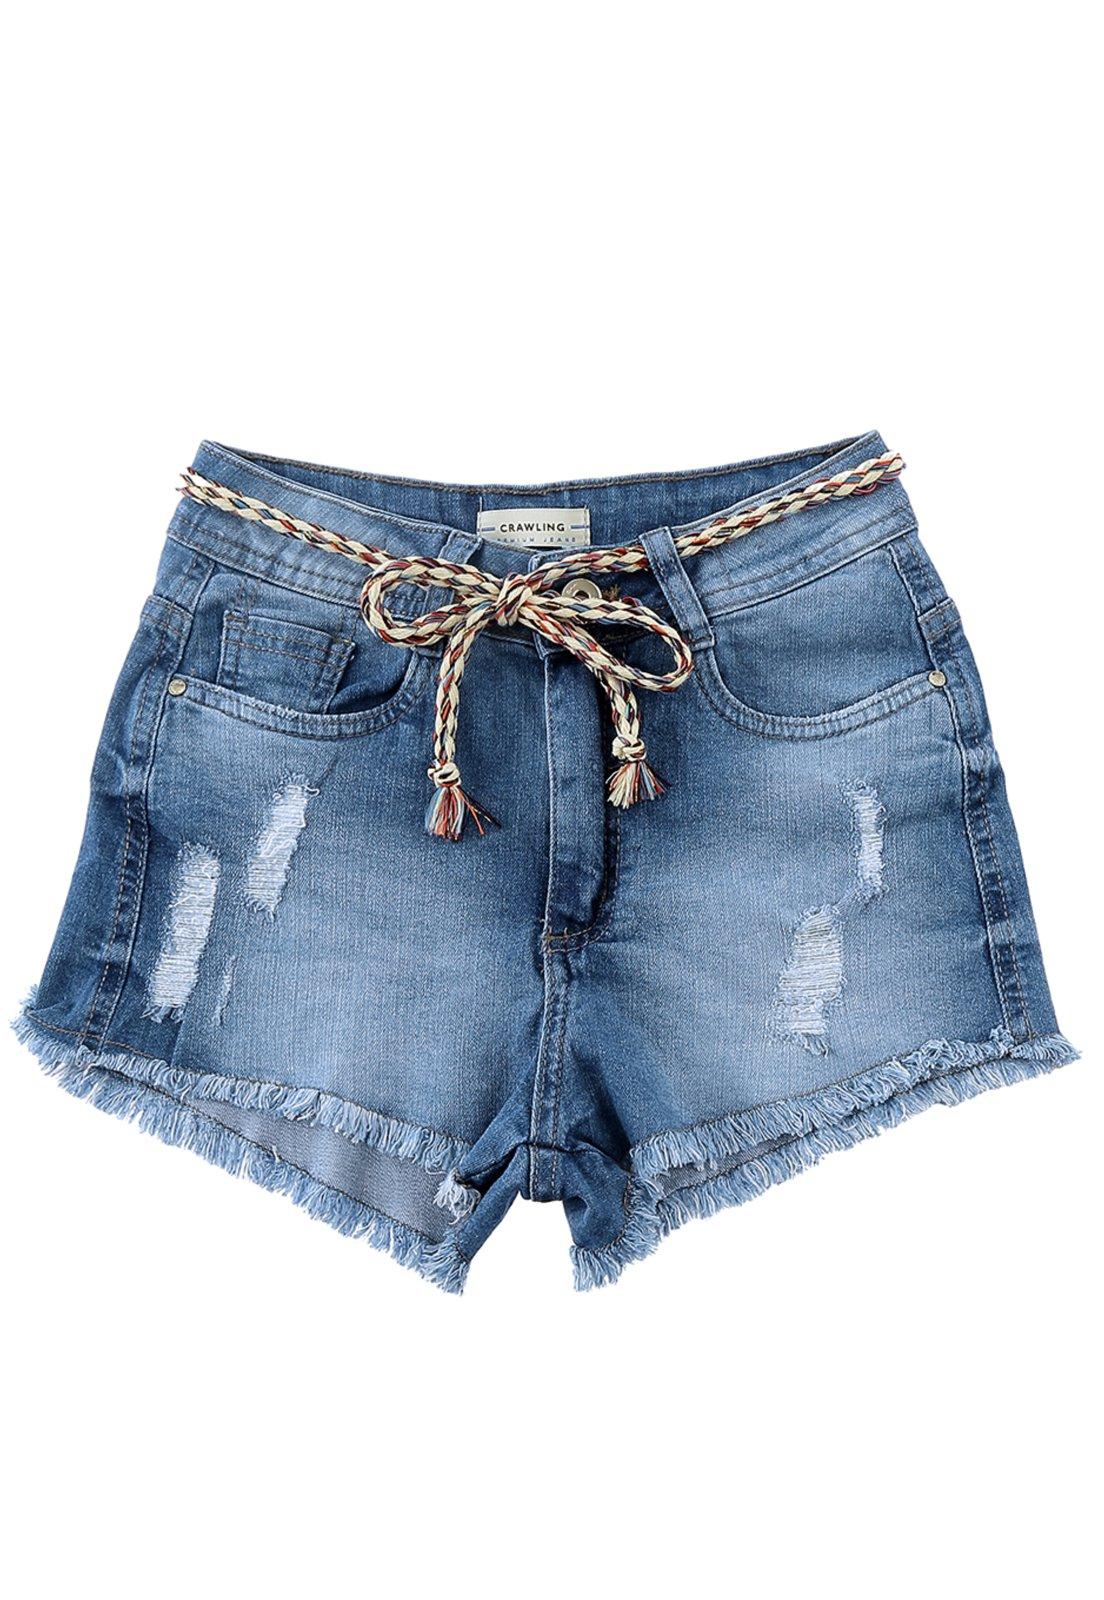 Short Feminino Asa Delta Crawling Jeans